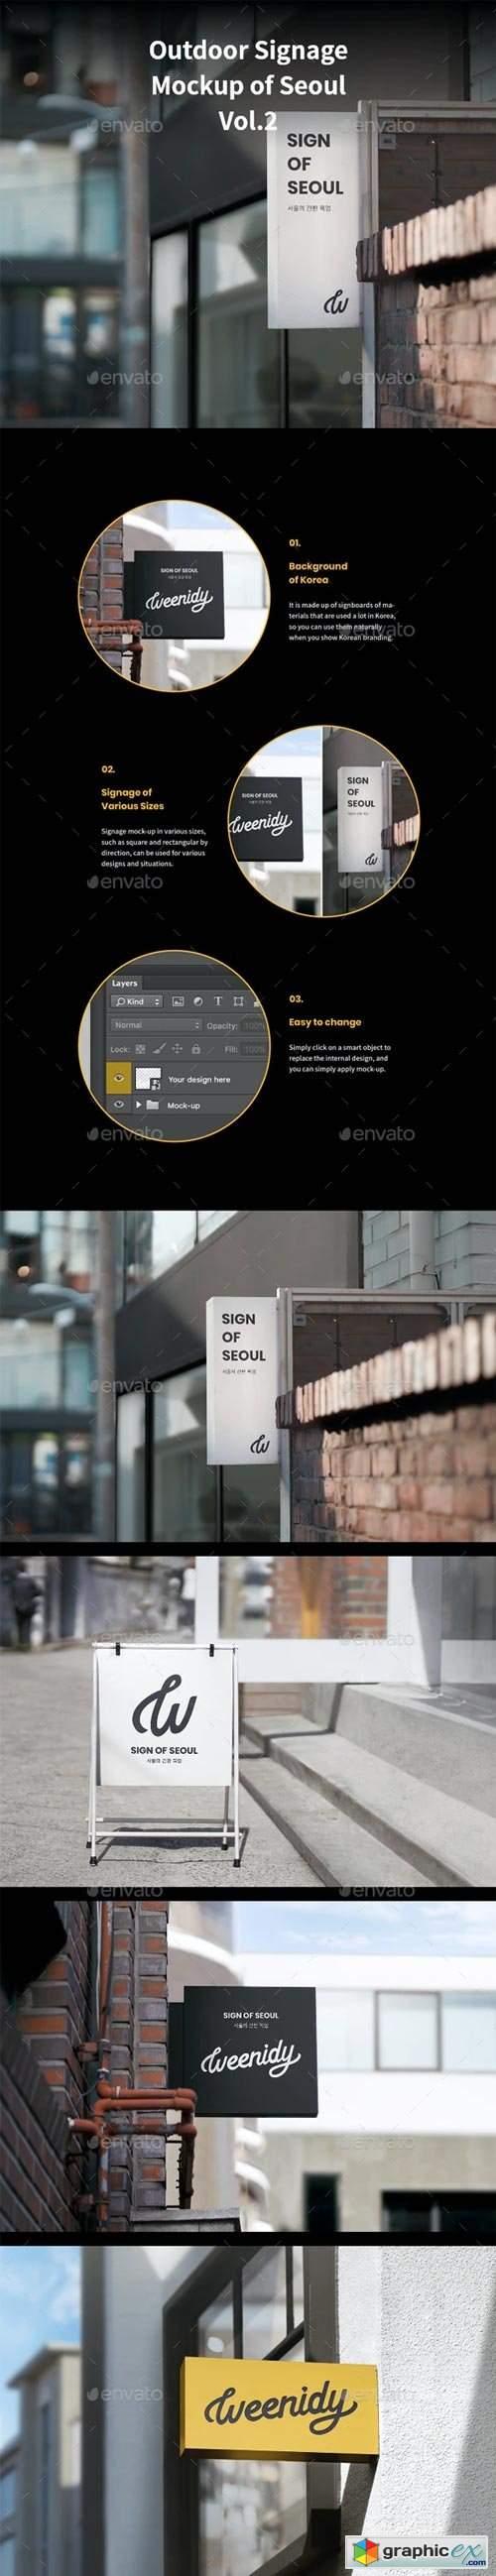 Outdoor Signage Mockup of Seoul Vol.2